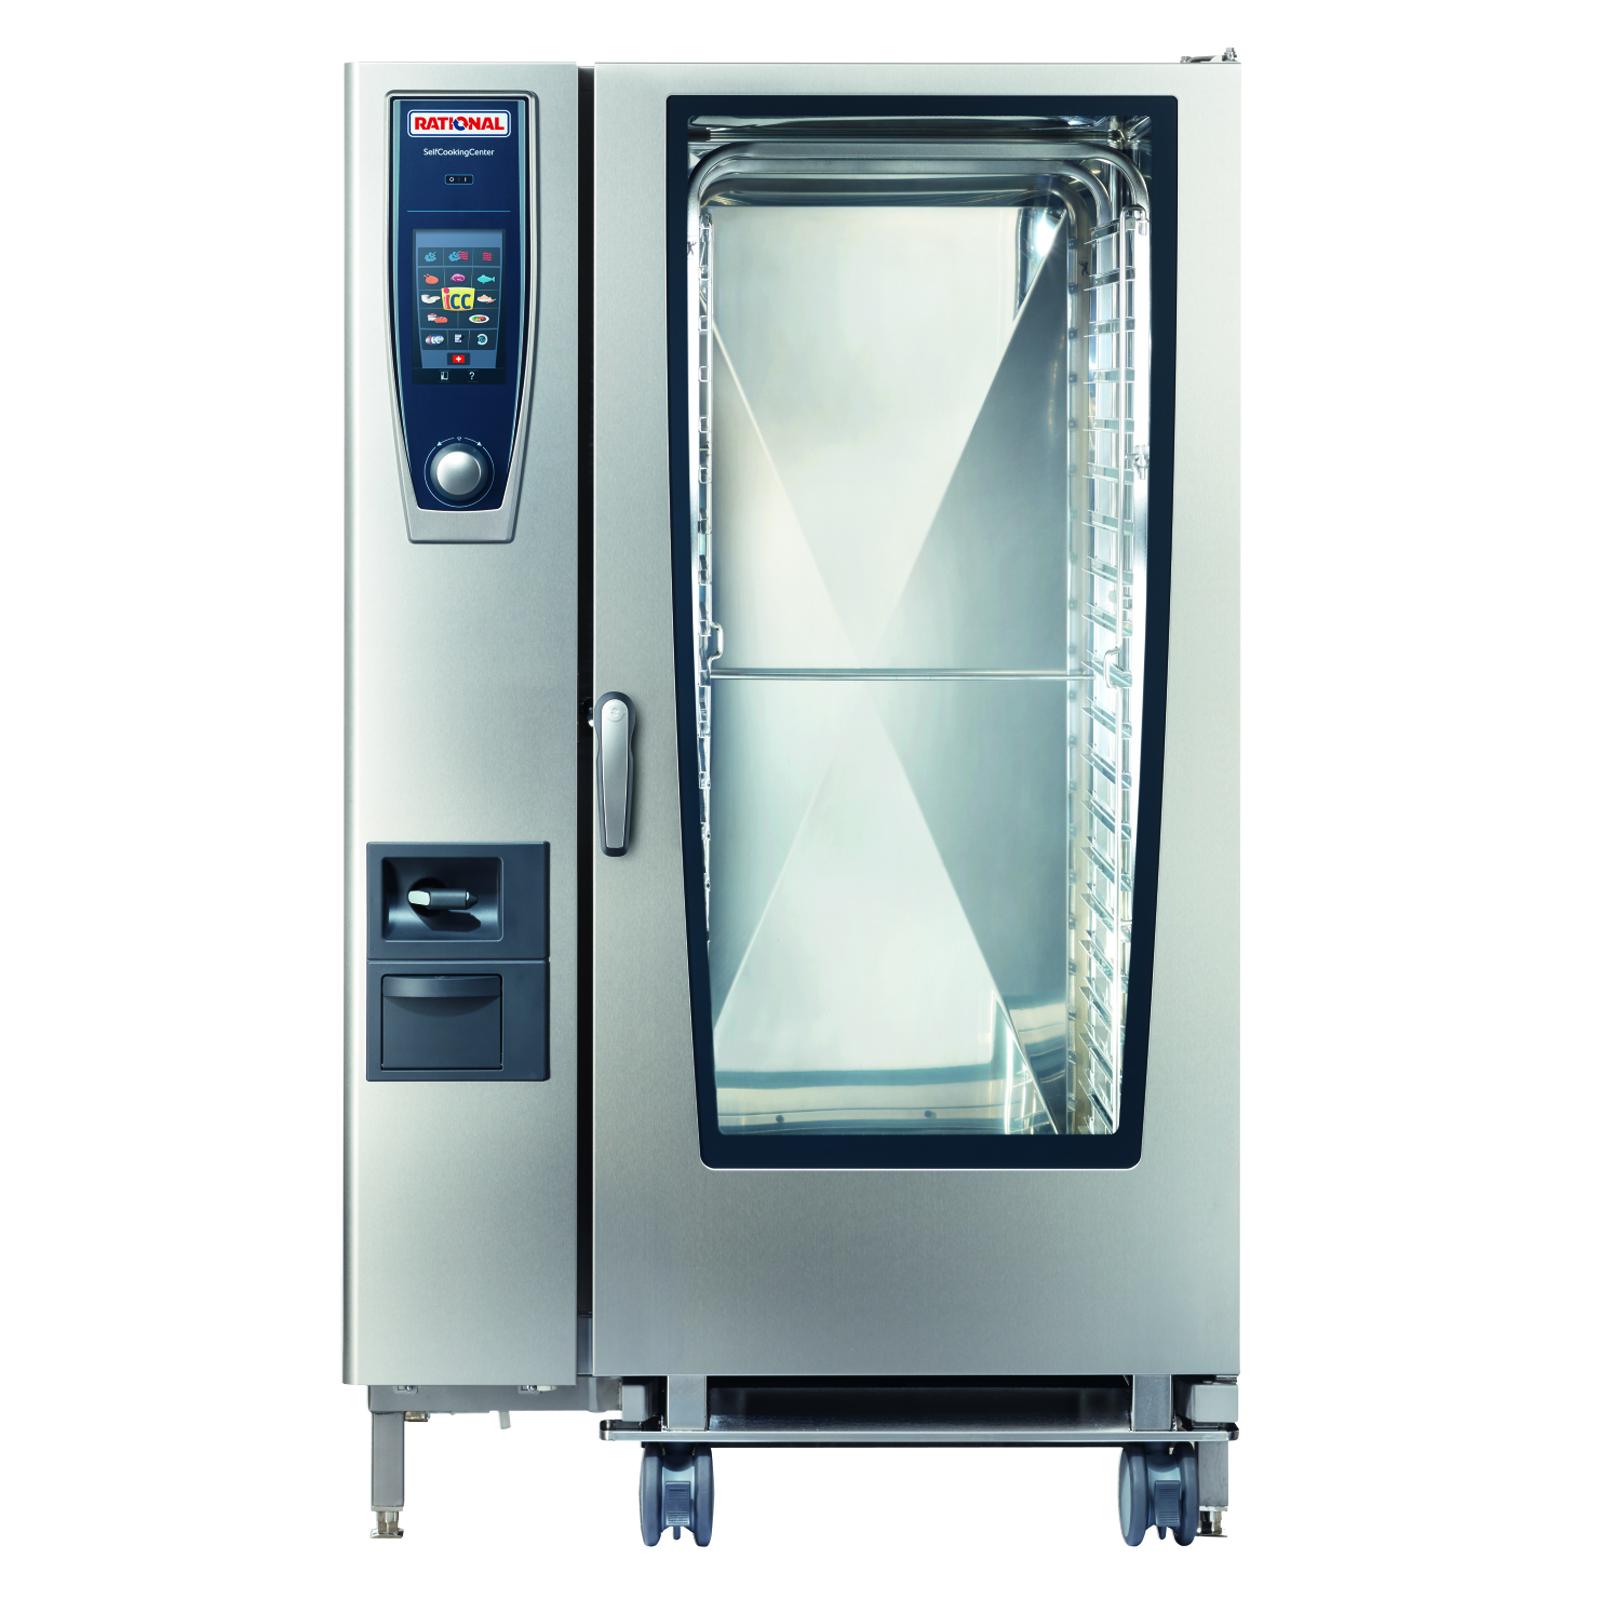 RATIONAL B228206.19E combi oven, gas